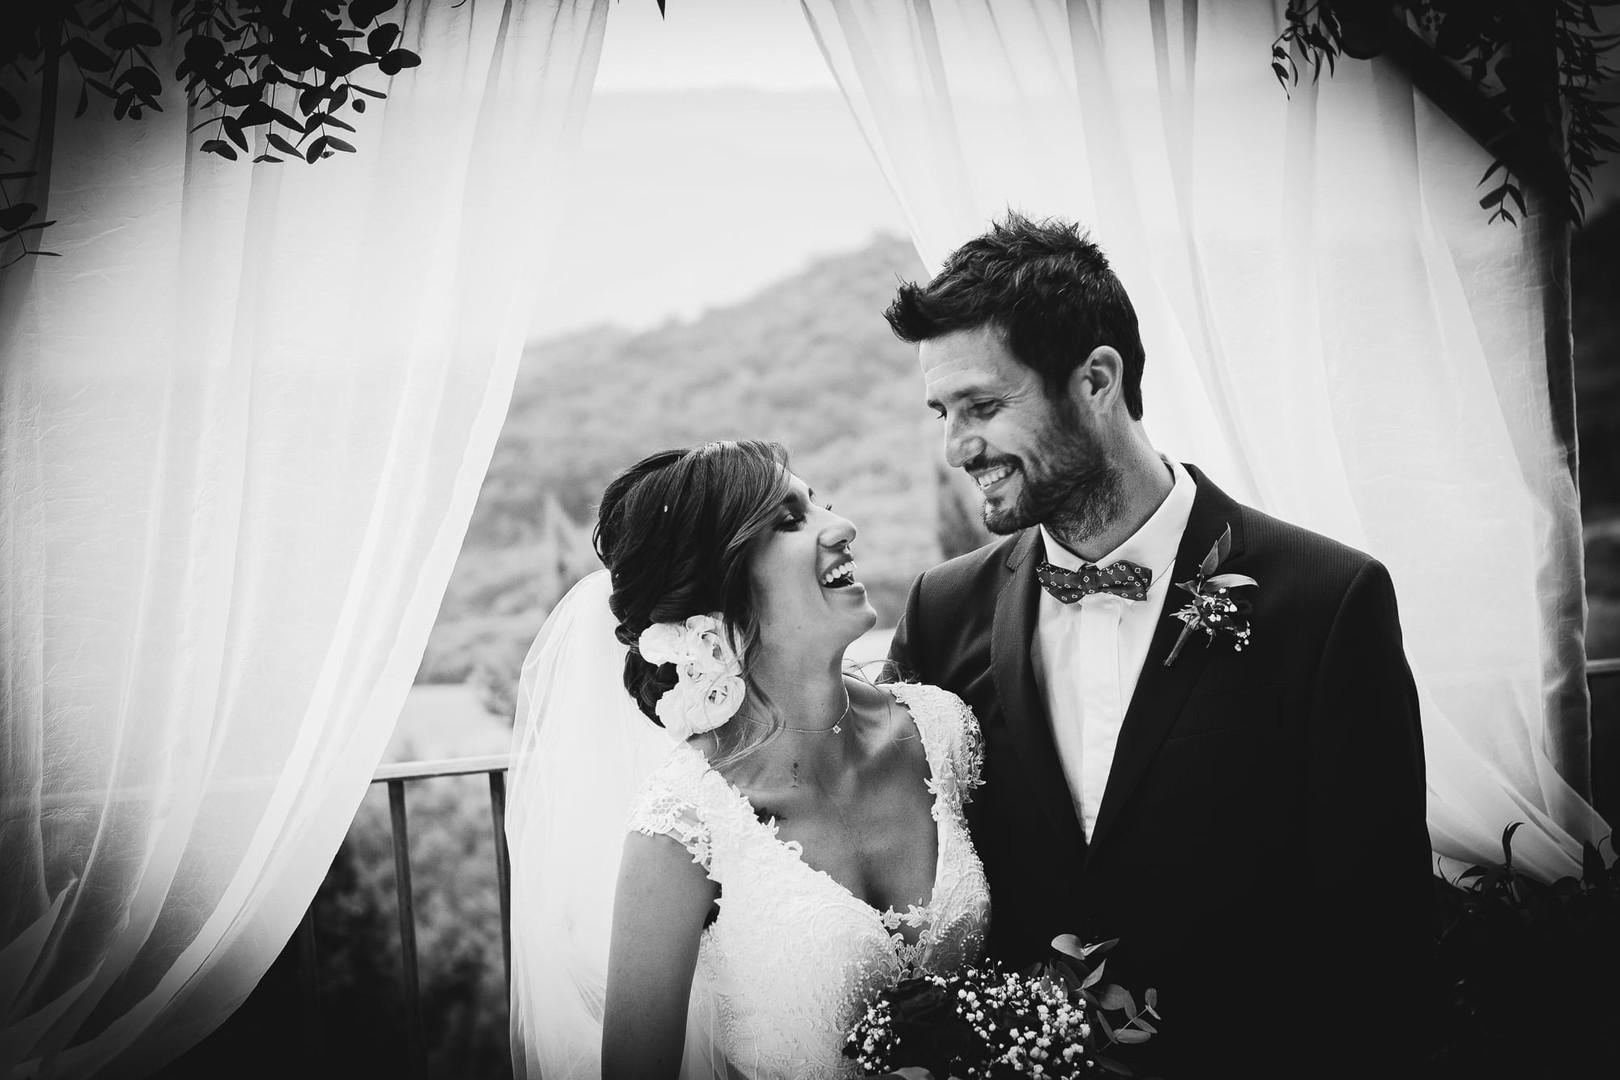 Wedding - Andrea Viti Photographer .jpg